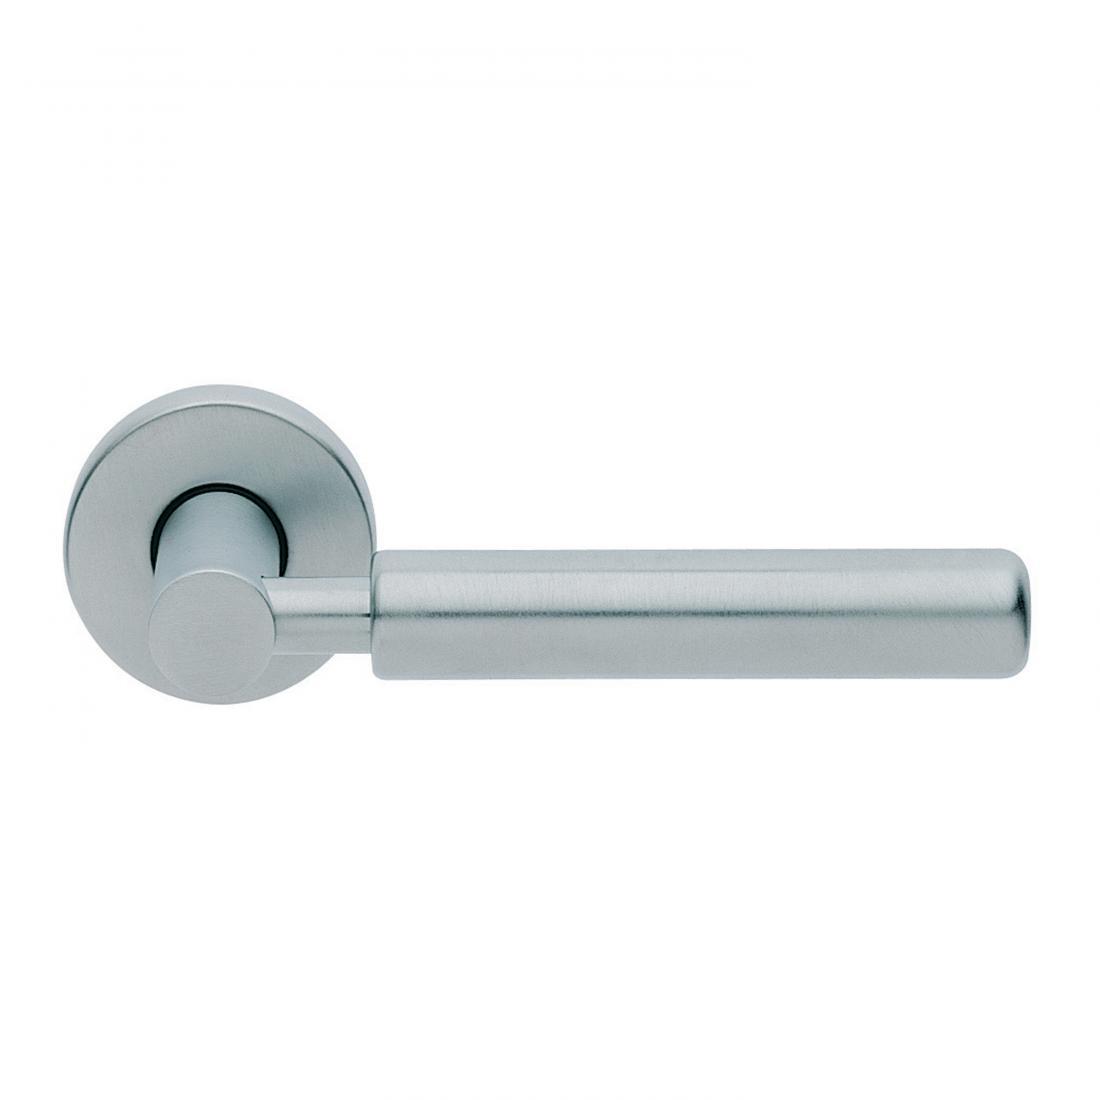 Satin chrome poign e de porte pour manital hamlet vente en - Poignees de porte interieure vente en ligne ...